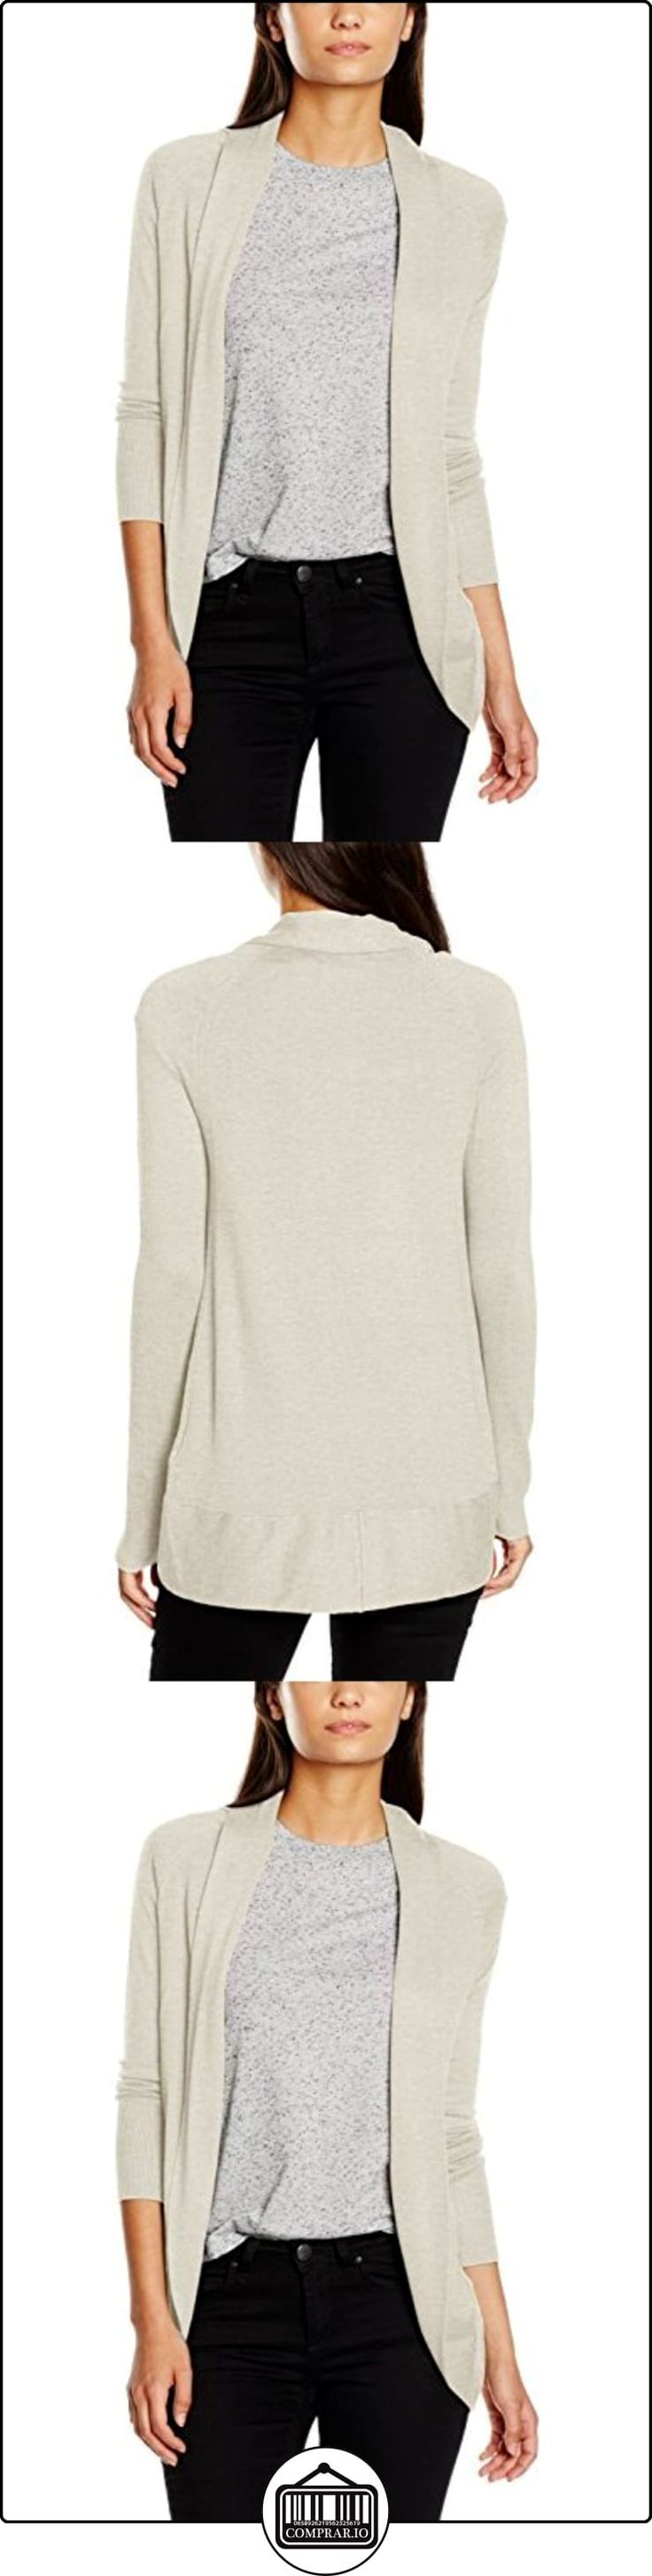 ONLY onlMILA L/S OPEN CARDIGAN KNT, chaqueta punto Mujer, Gris (Whitecap Gray), 40 (Talla del fabricante: Large)  ✿ Ropa de punto ✿